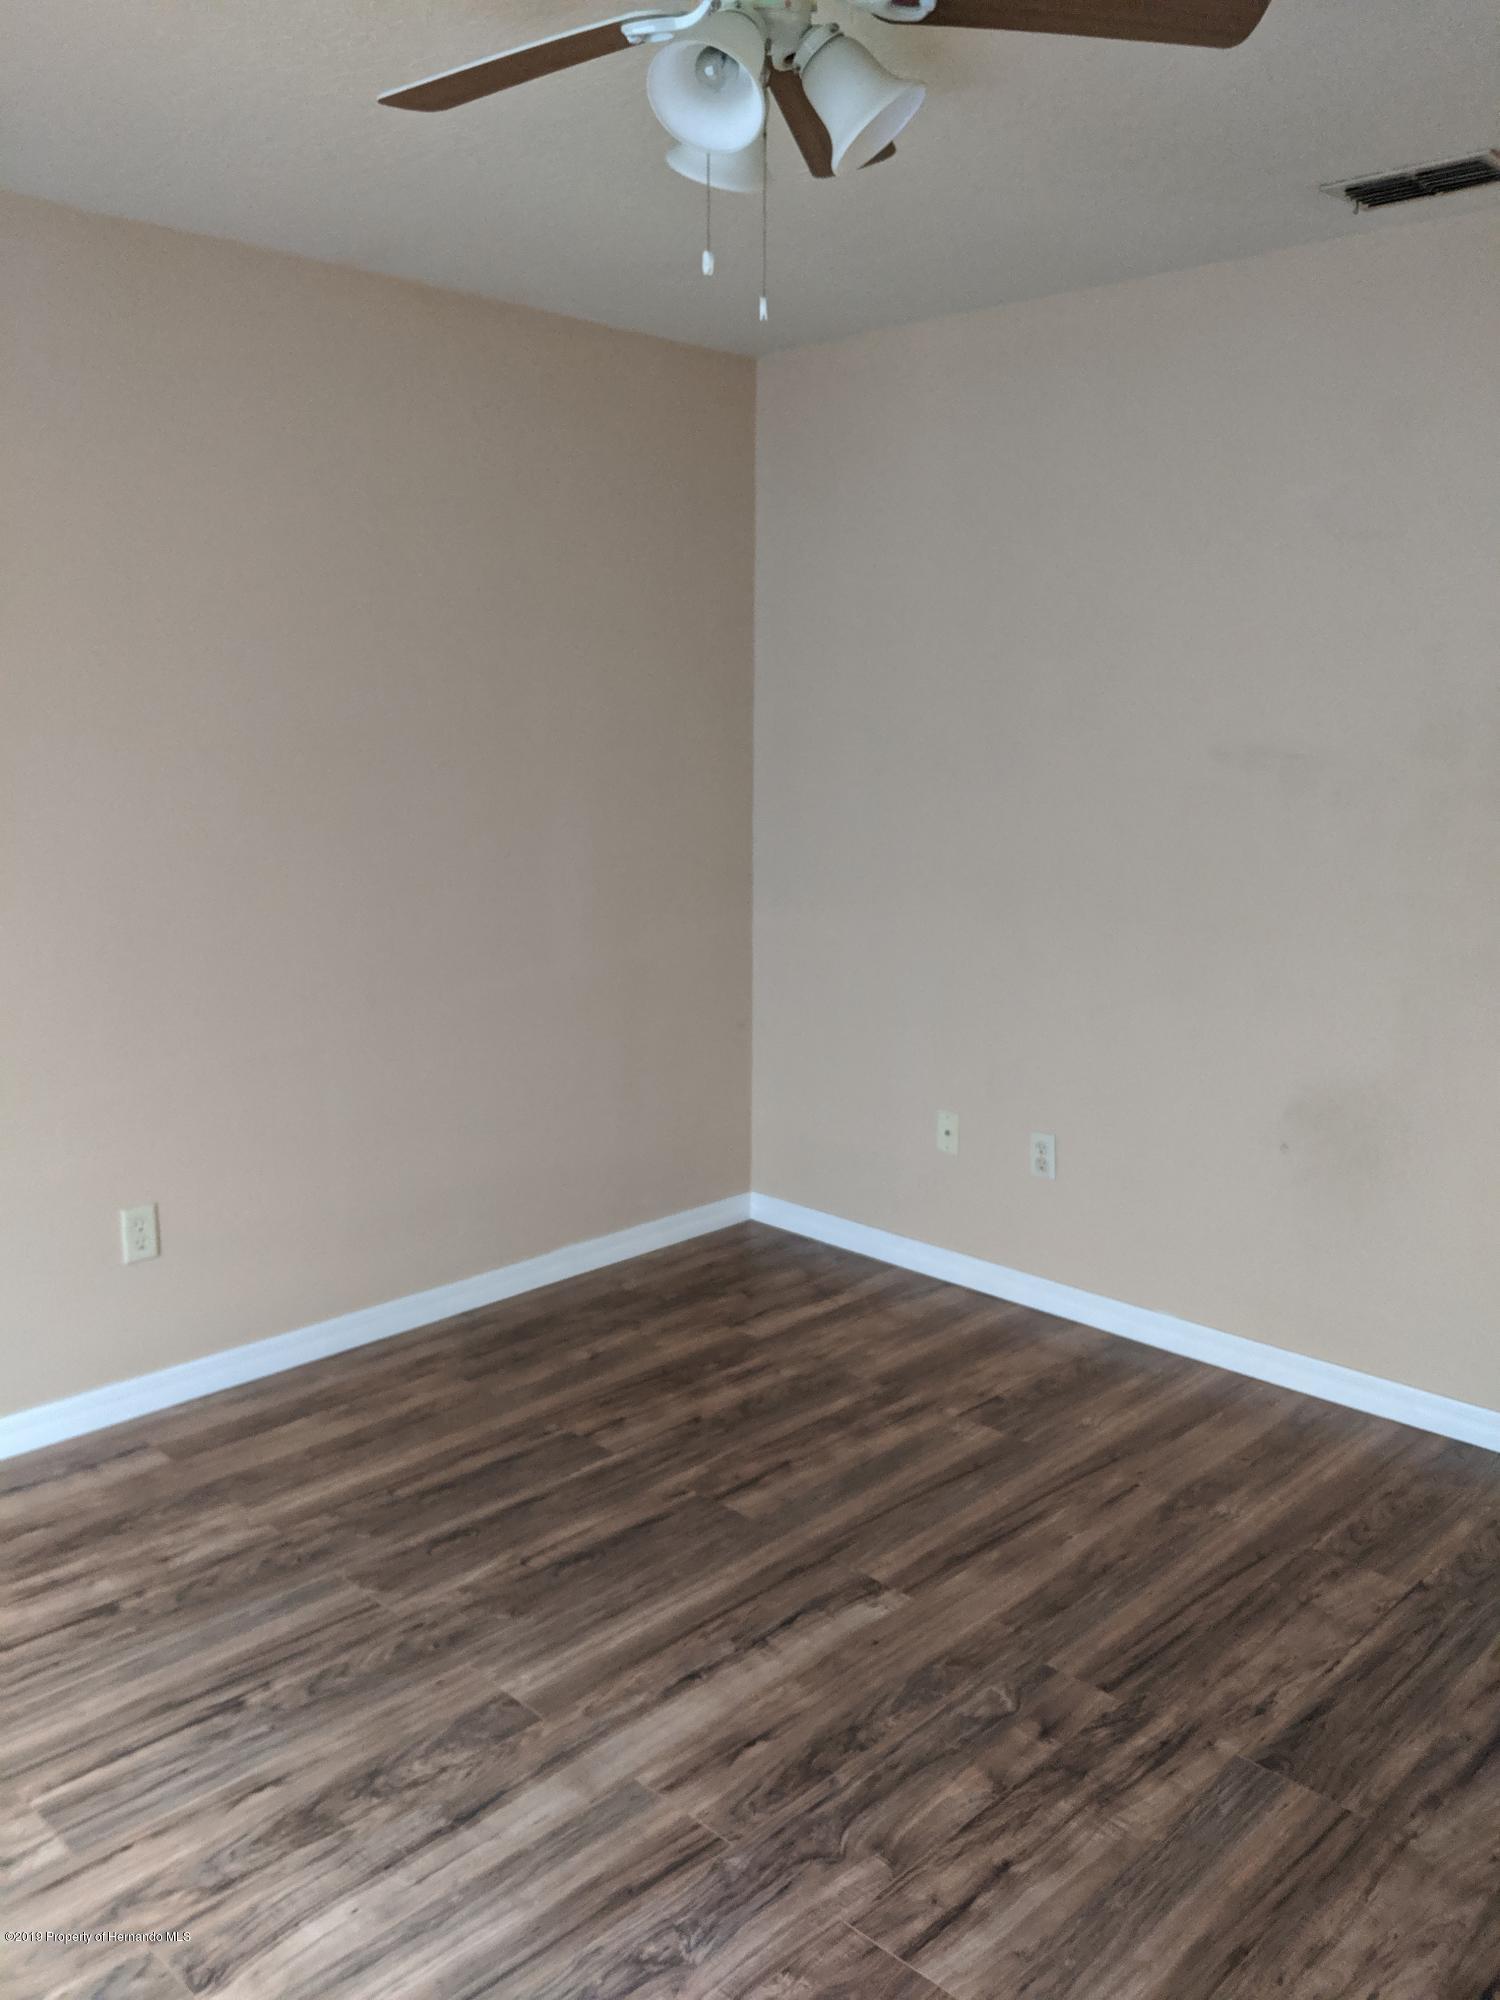 6073 Beechwood Drive, Ridge Manor, Florida 33523, 3 Bedrooms Bedrooms, ,2 BathroomsBathrooms,Rental,For Sale,Beechwood,2206046